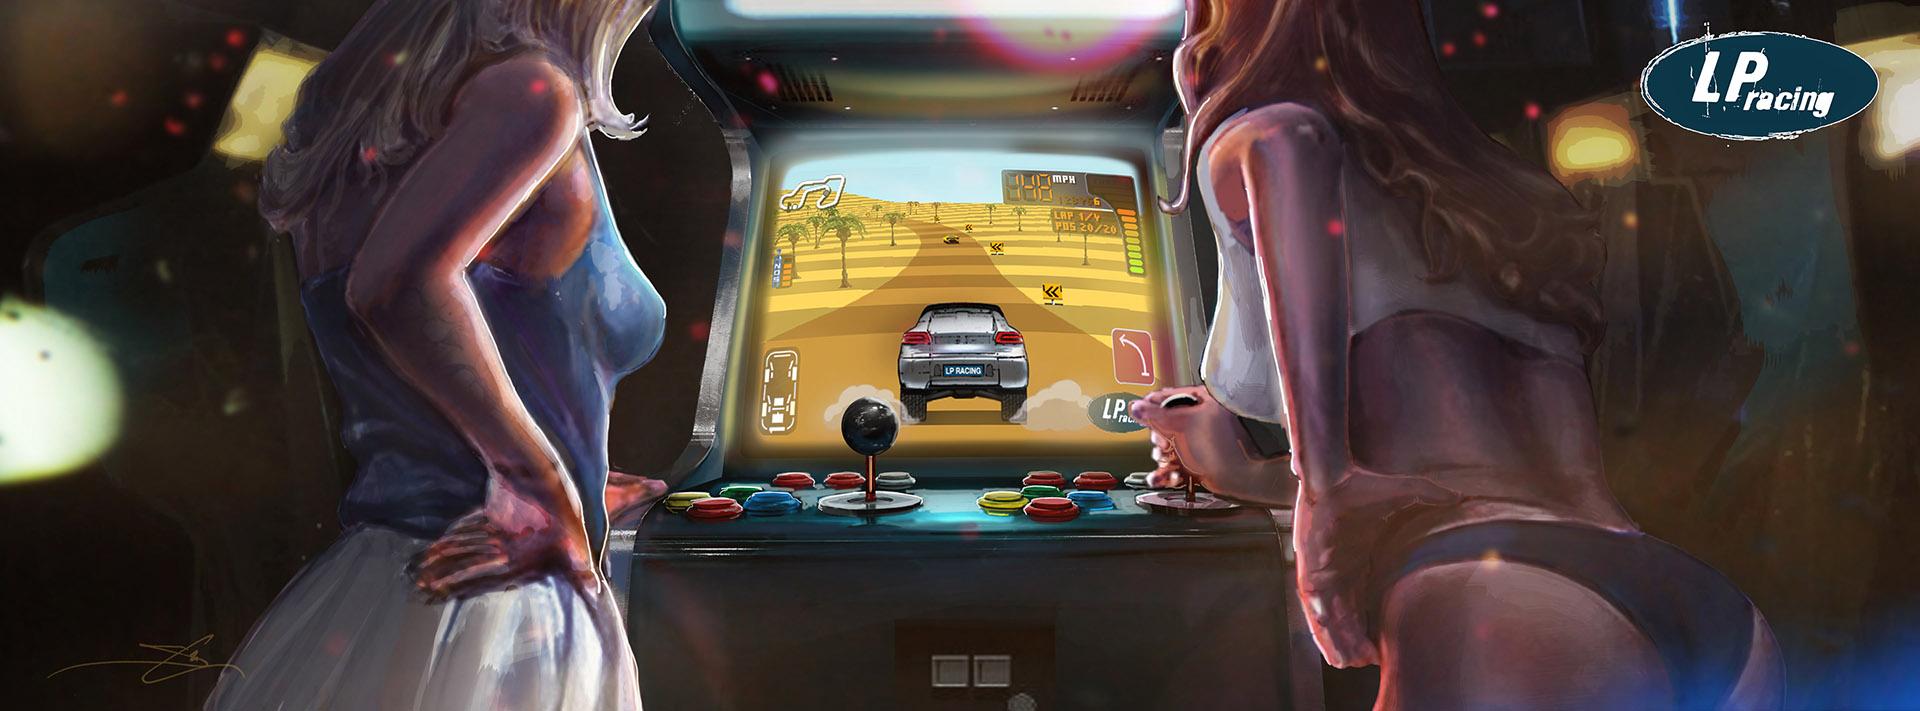 arcade_1920x